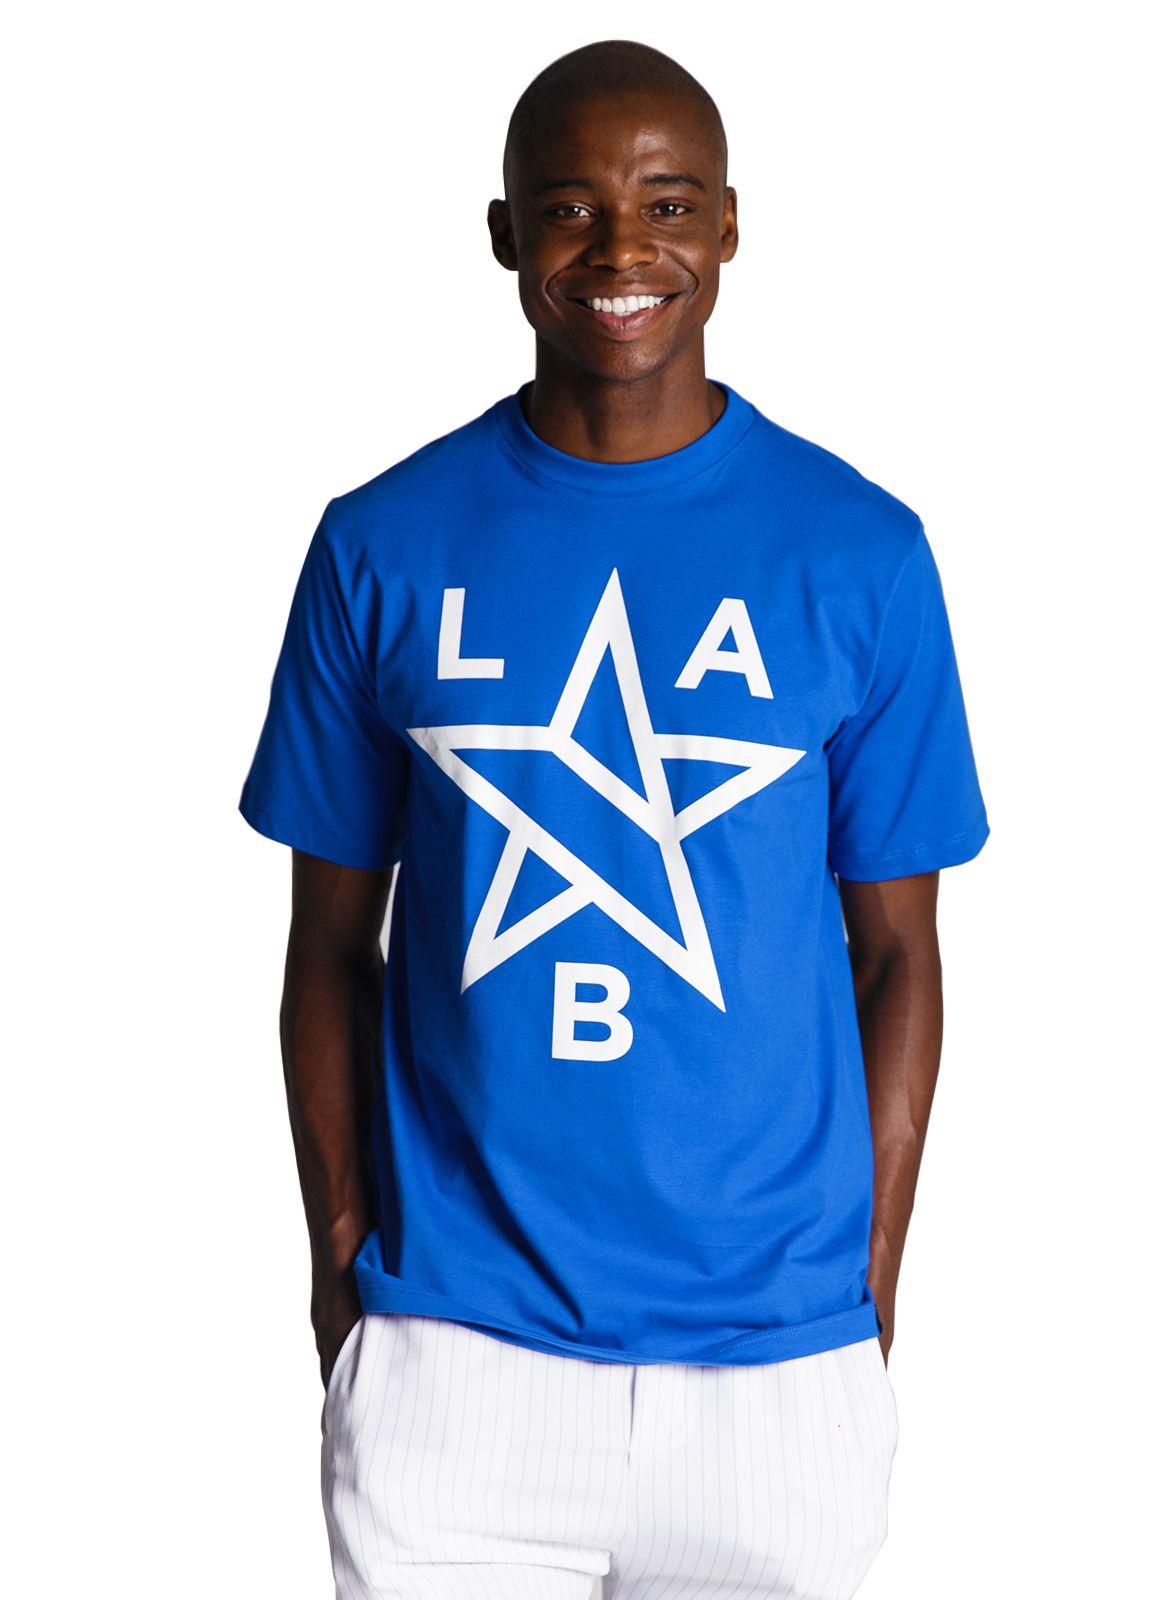 Camiseta Básica Lab Estrela Azul Turco